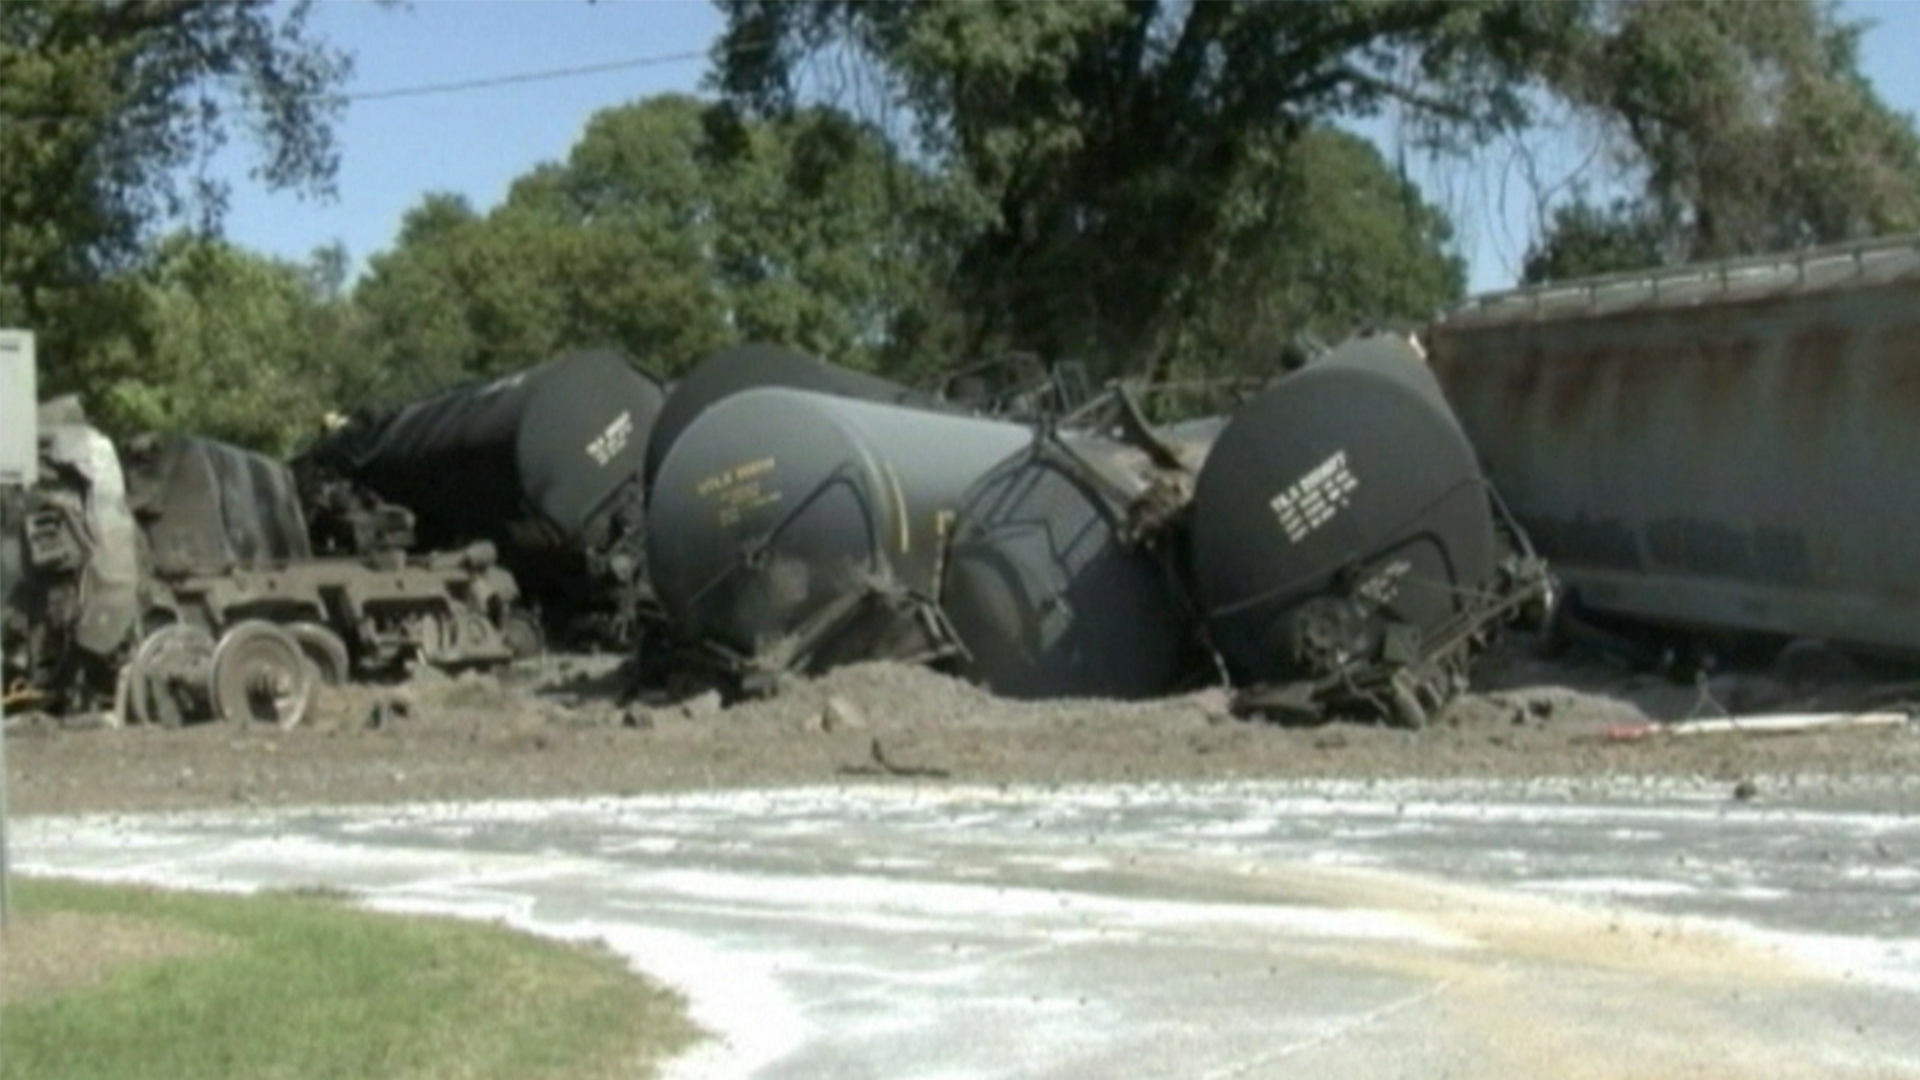 Matt Lauer Cars >> Freight Train Collides With Transport Truck in Louisiana - NBC News